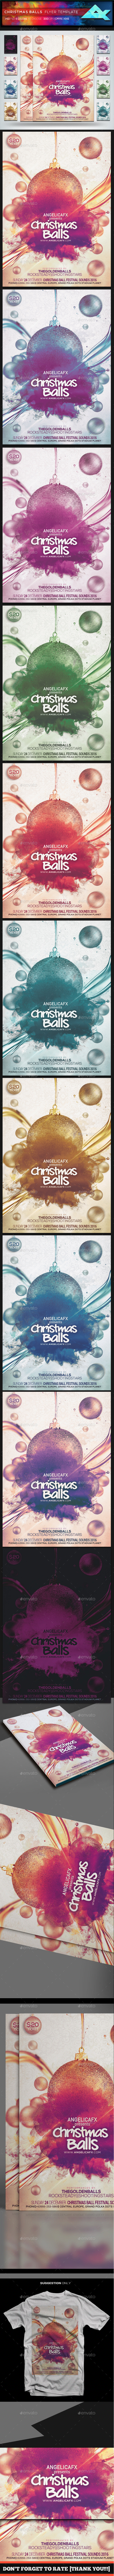 Christmas Balls Flyer Template - Flyers Print Templates